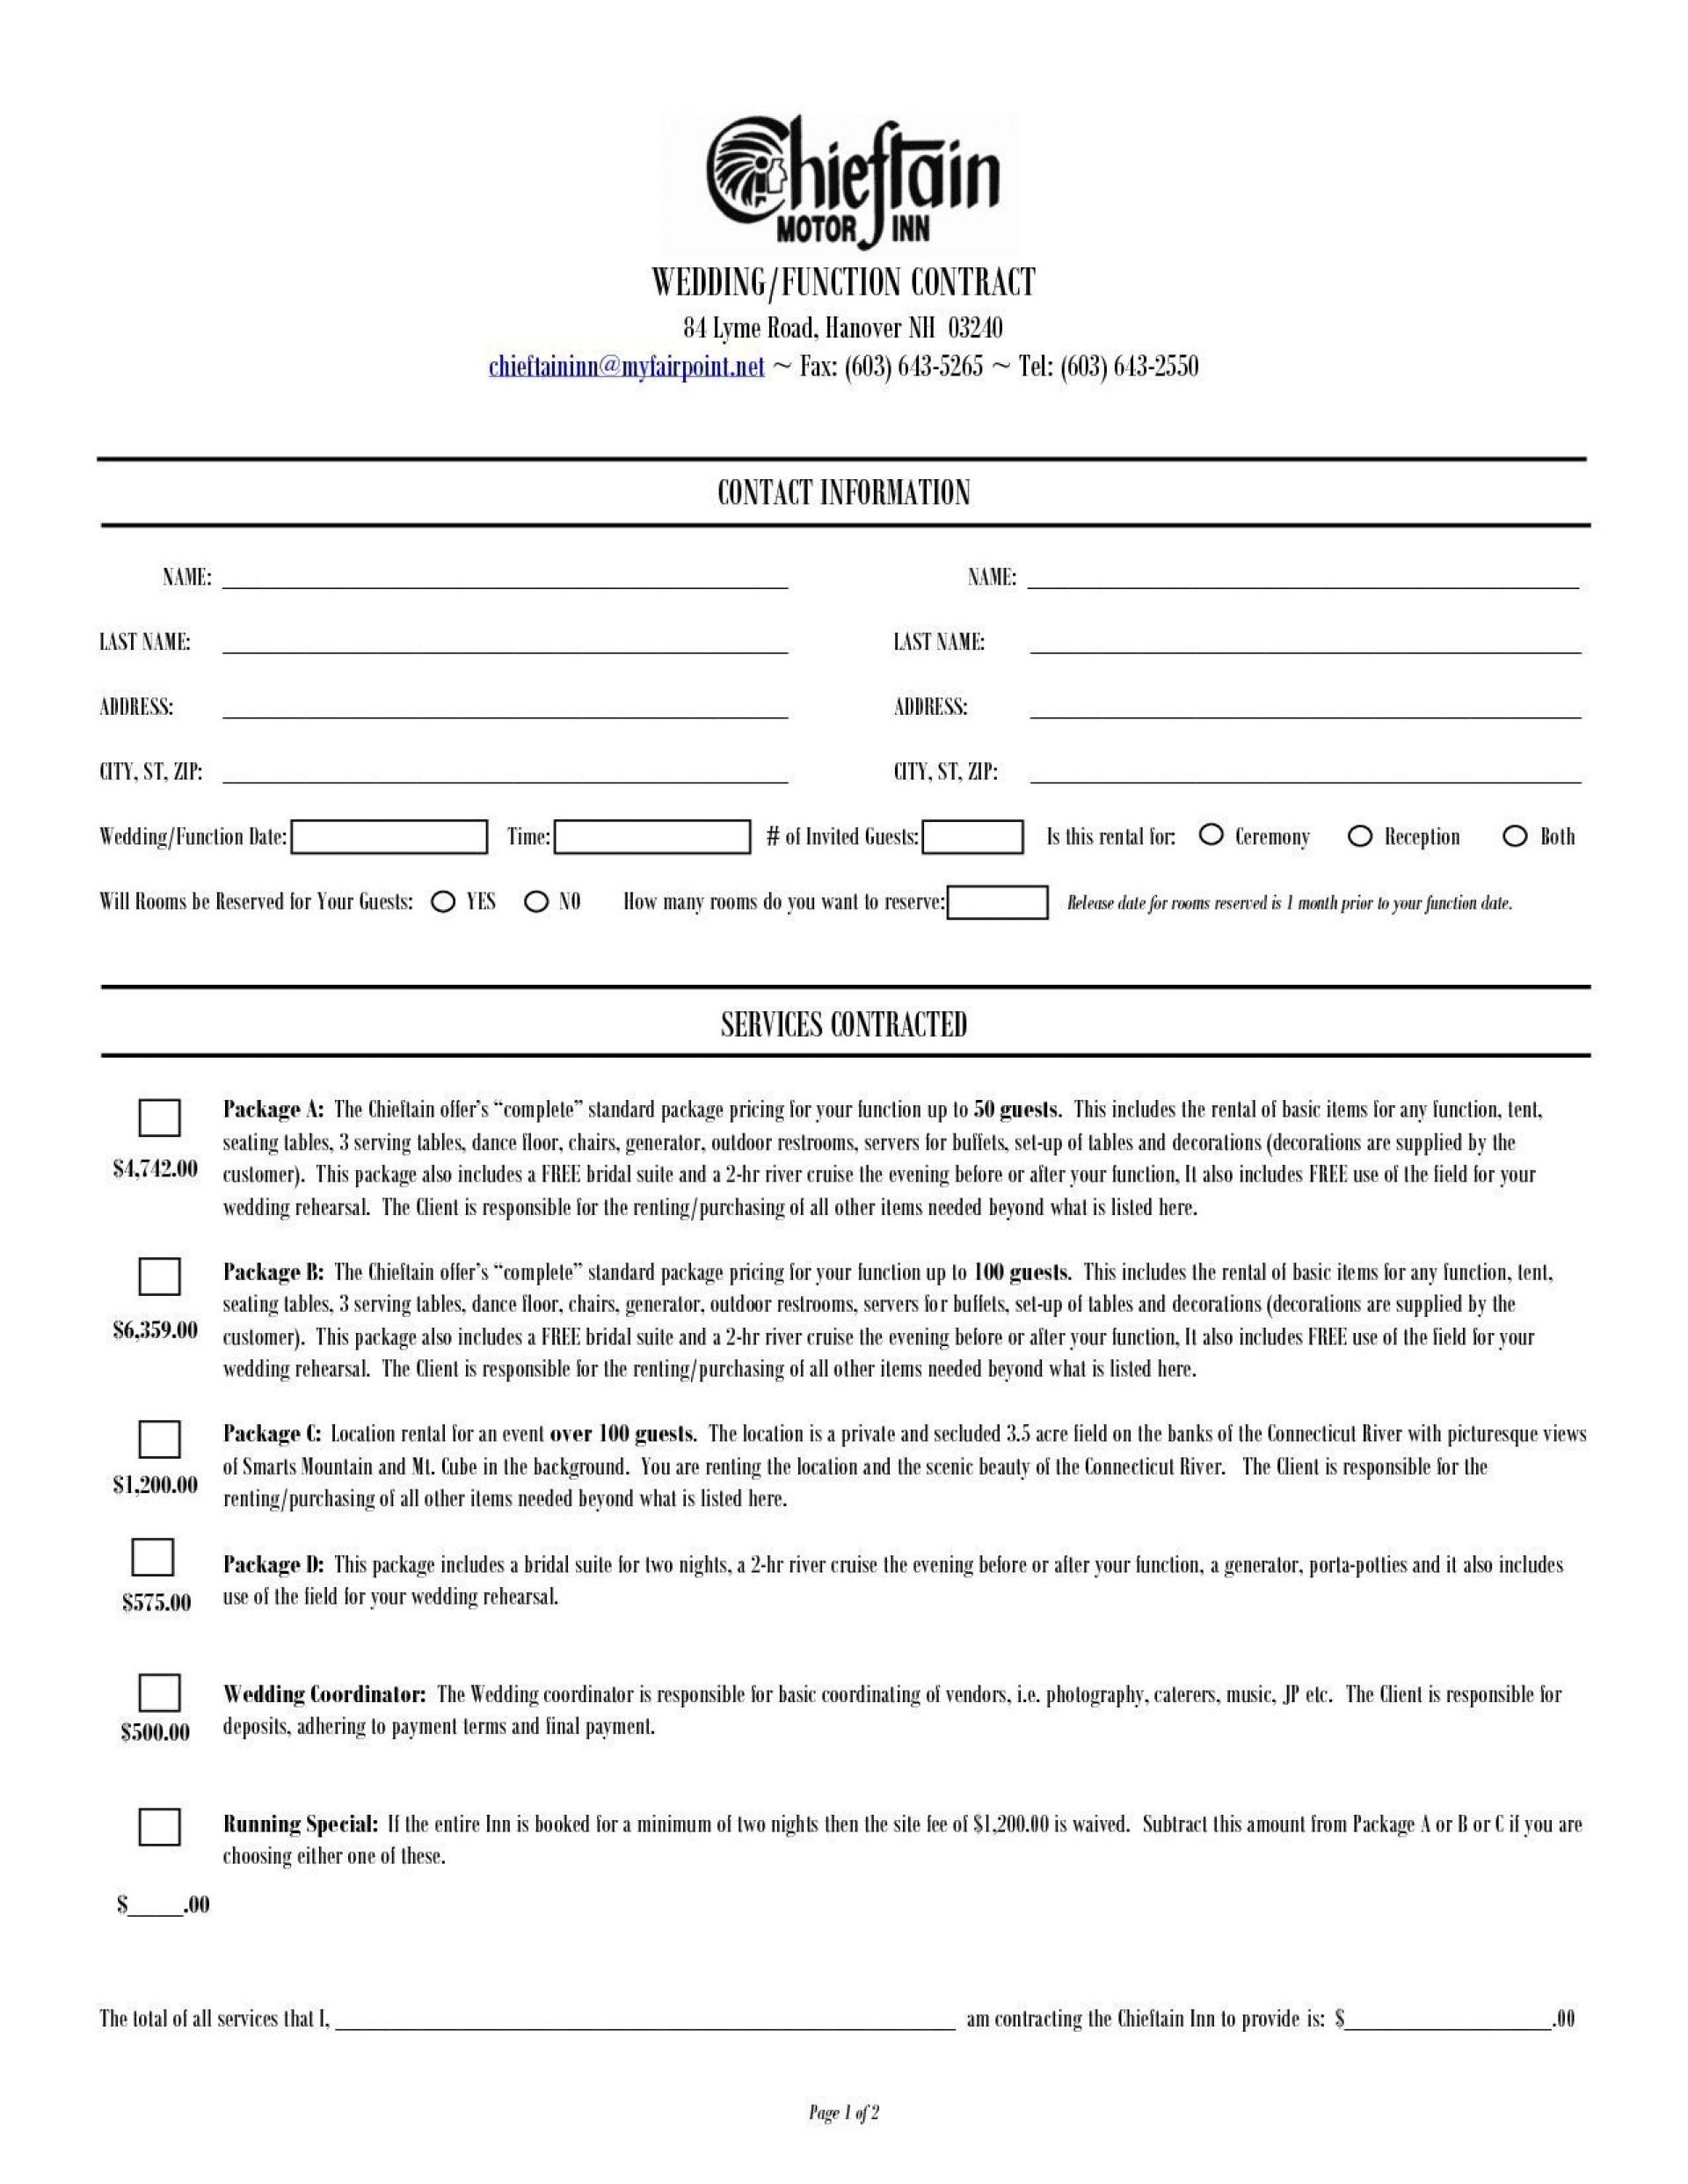 000 Dreaded Wedding Planner Contract Template Idea  Word Planning Coordinator Free1920